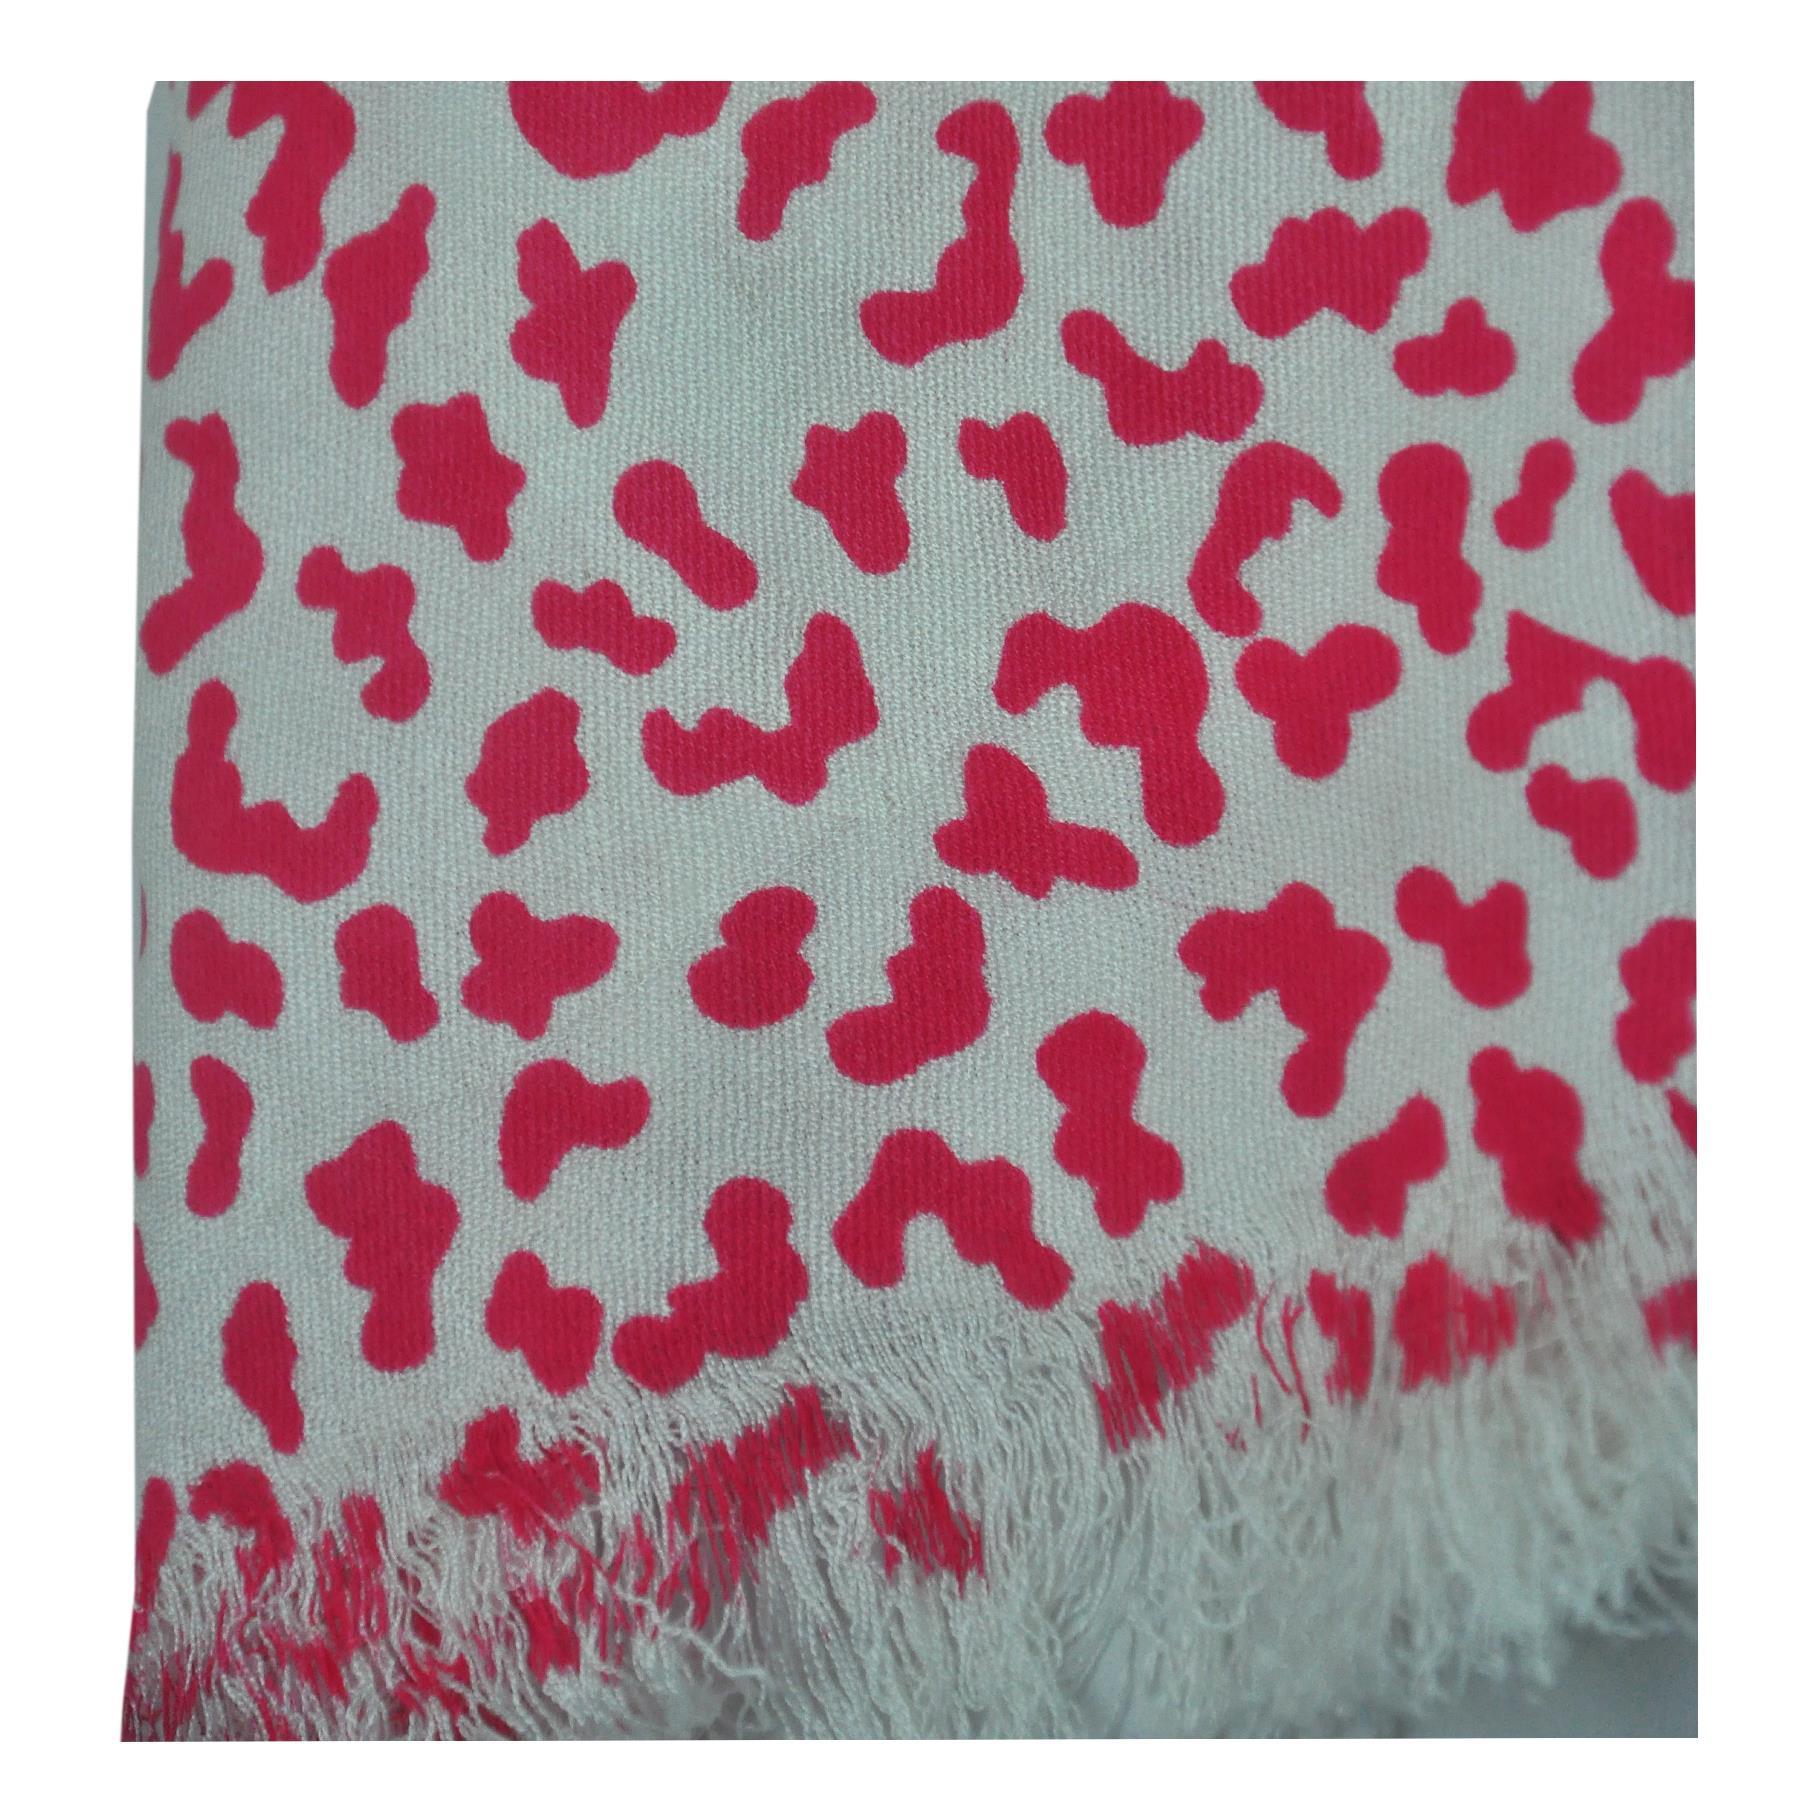 New-Leopard-Animal-Print-Soft-Warm-Winter-Head-Scarf-Shawl-Neck-Wrap thumbnail 7